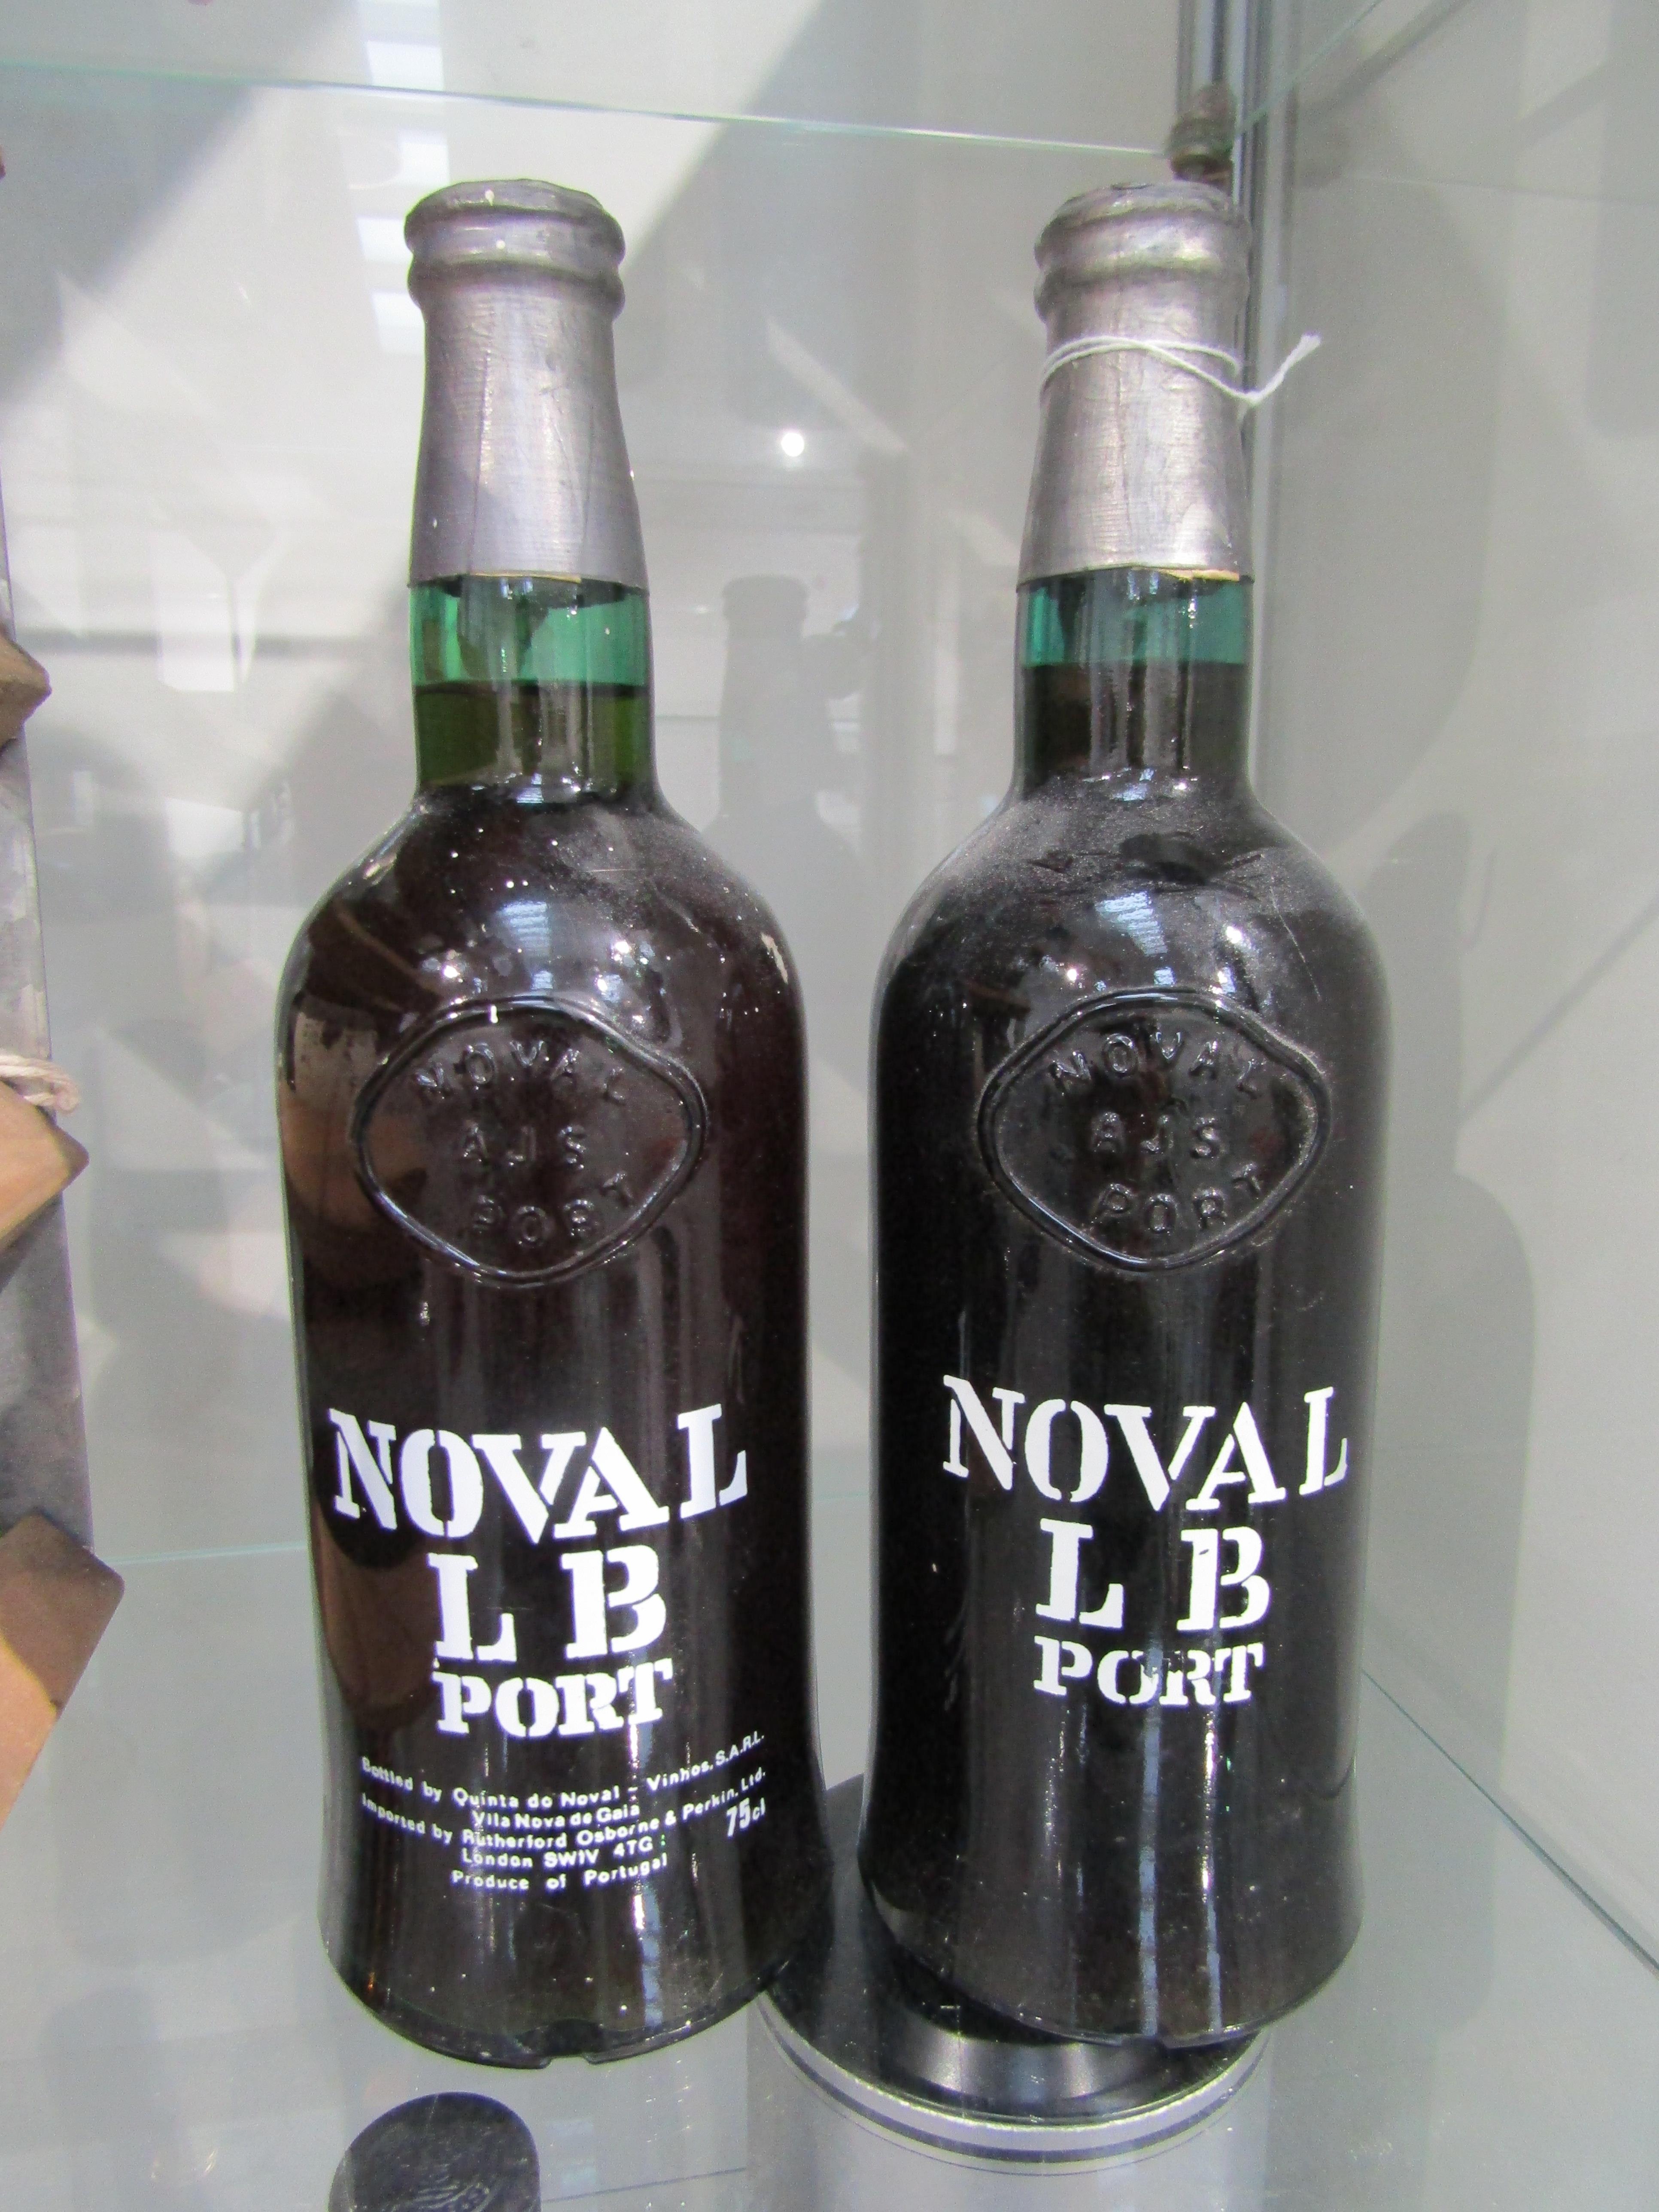 Lot 7056 - NV Noval LB Port,